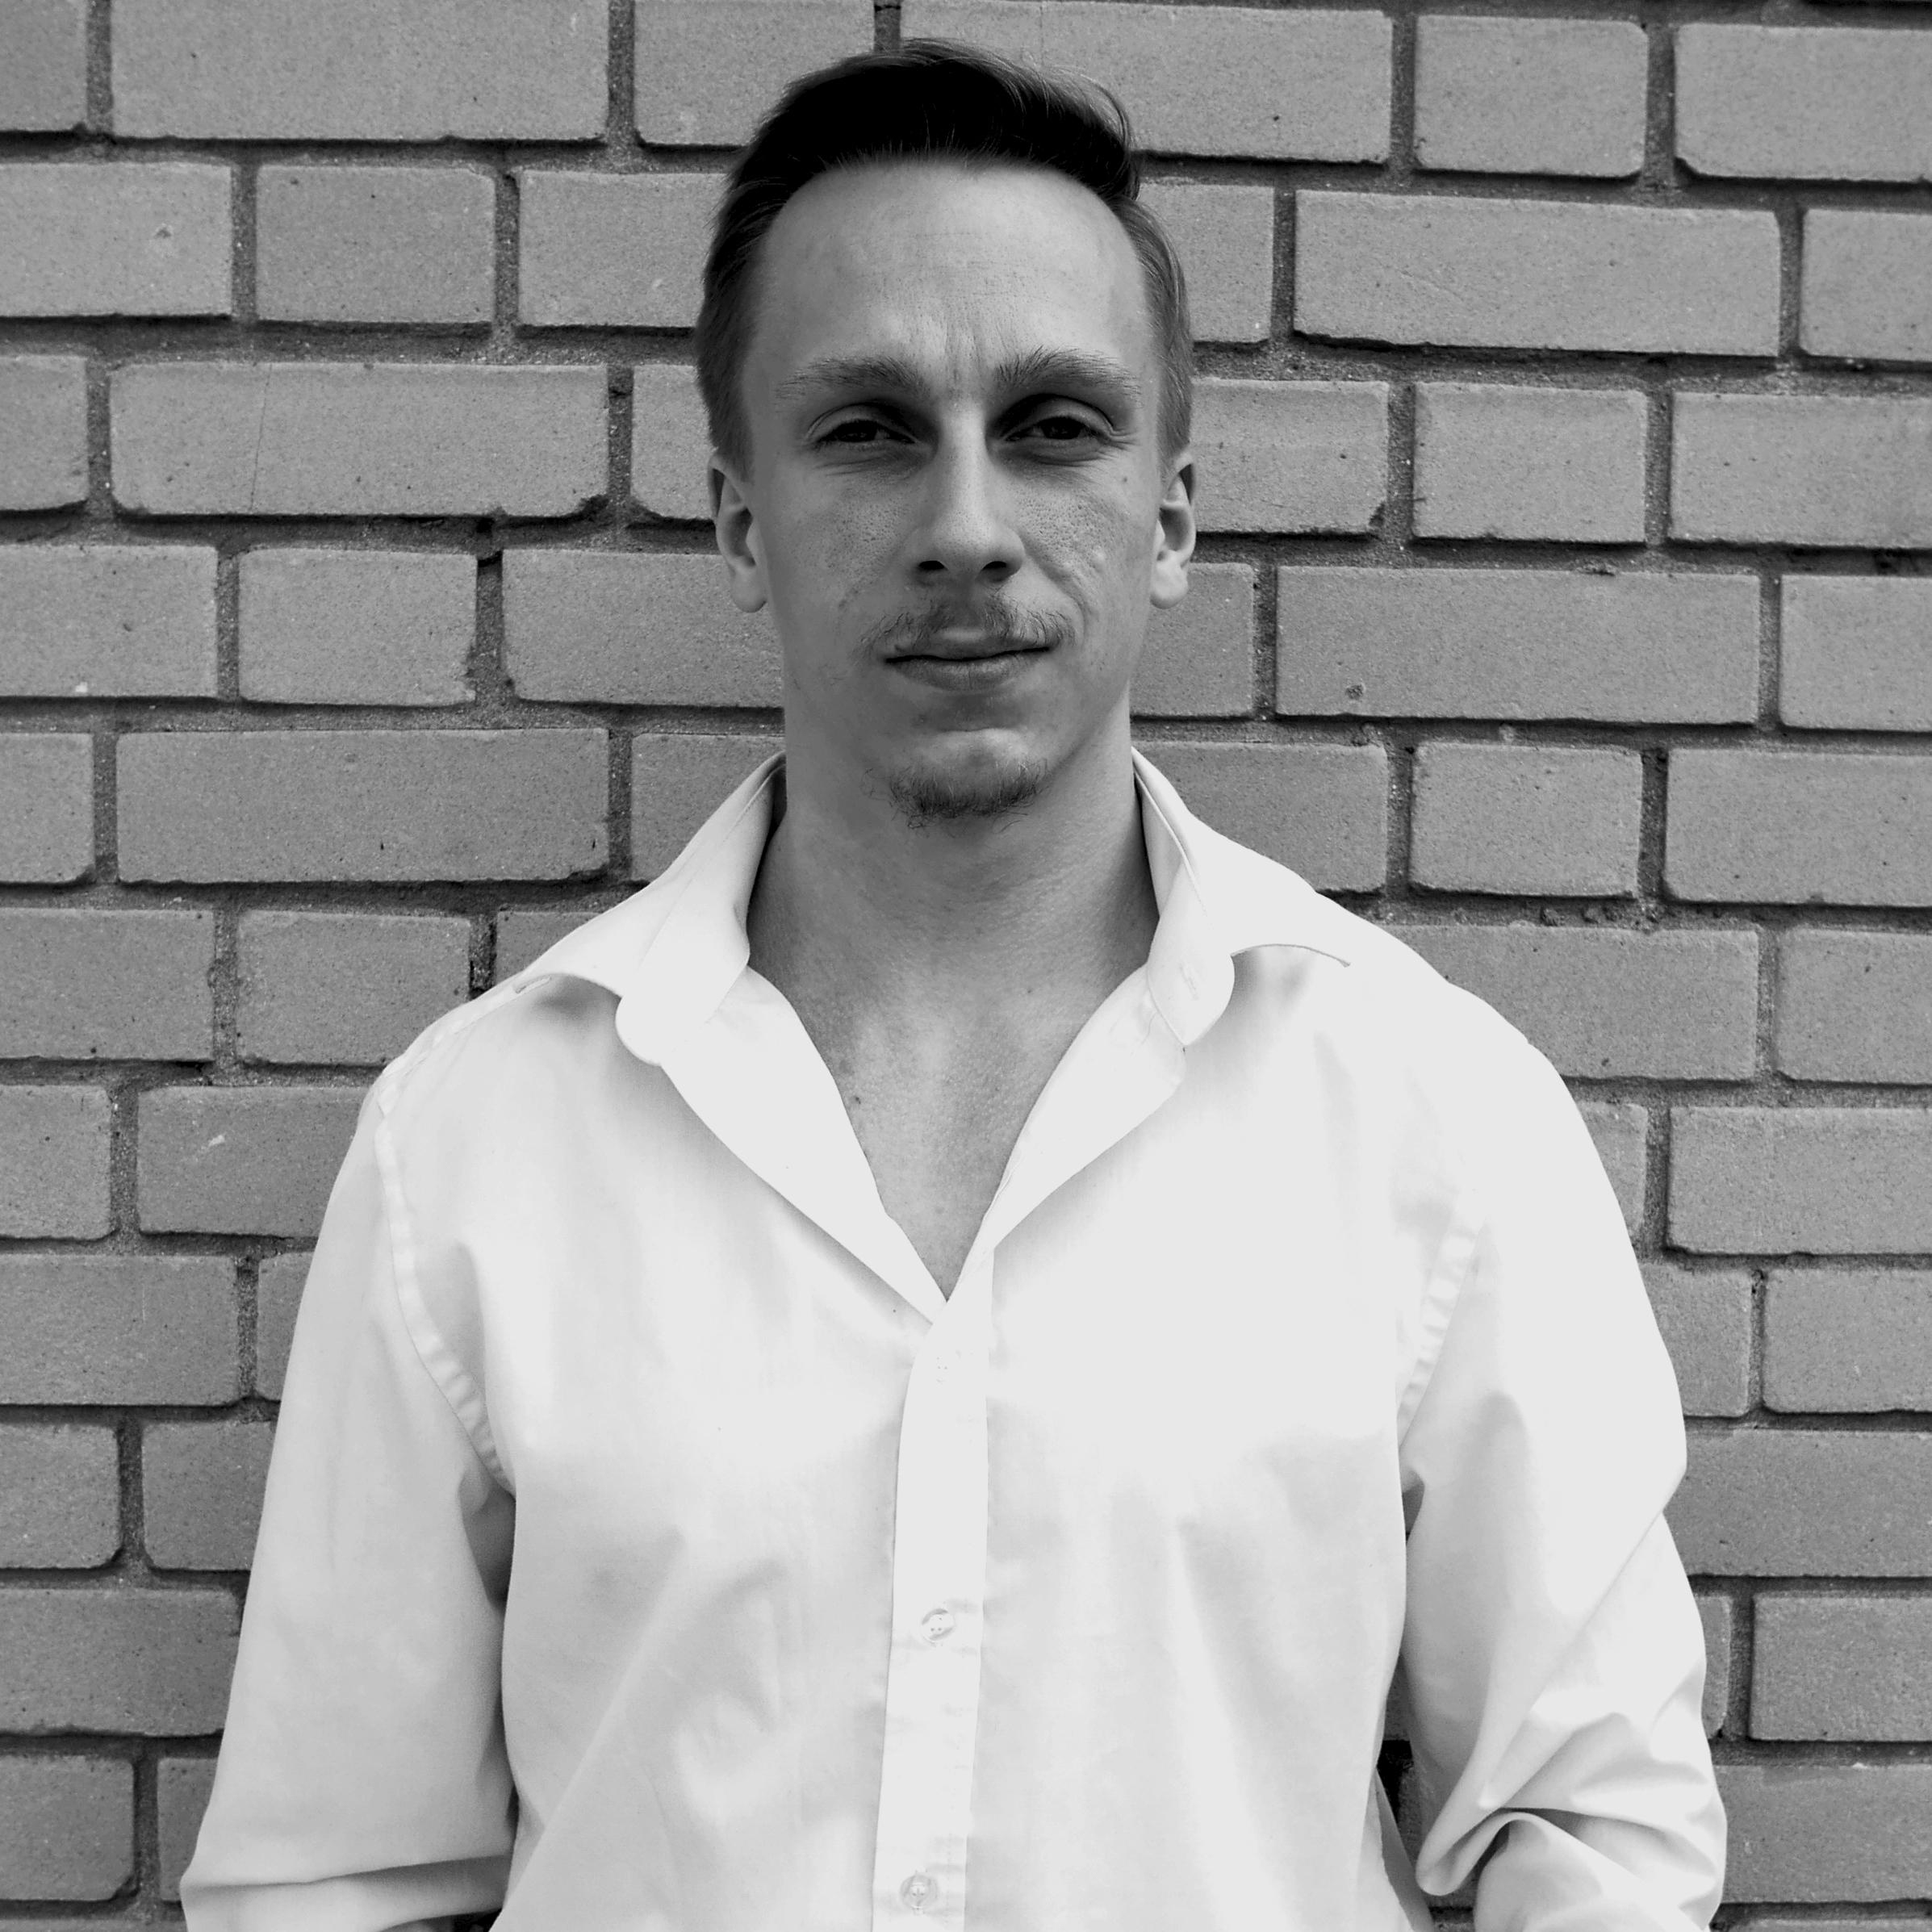 Ryan Daws, Editor TelecomsTech